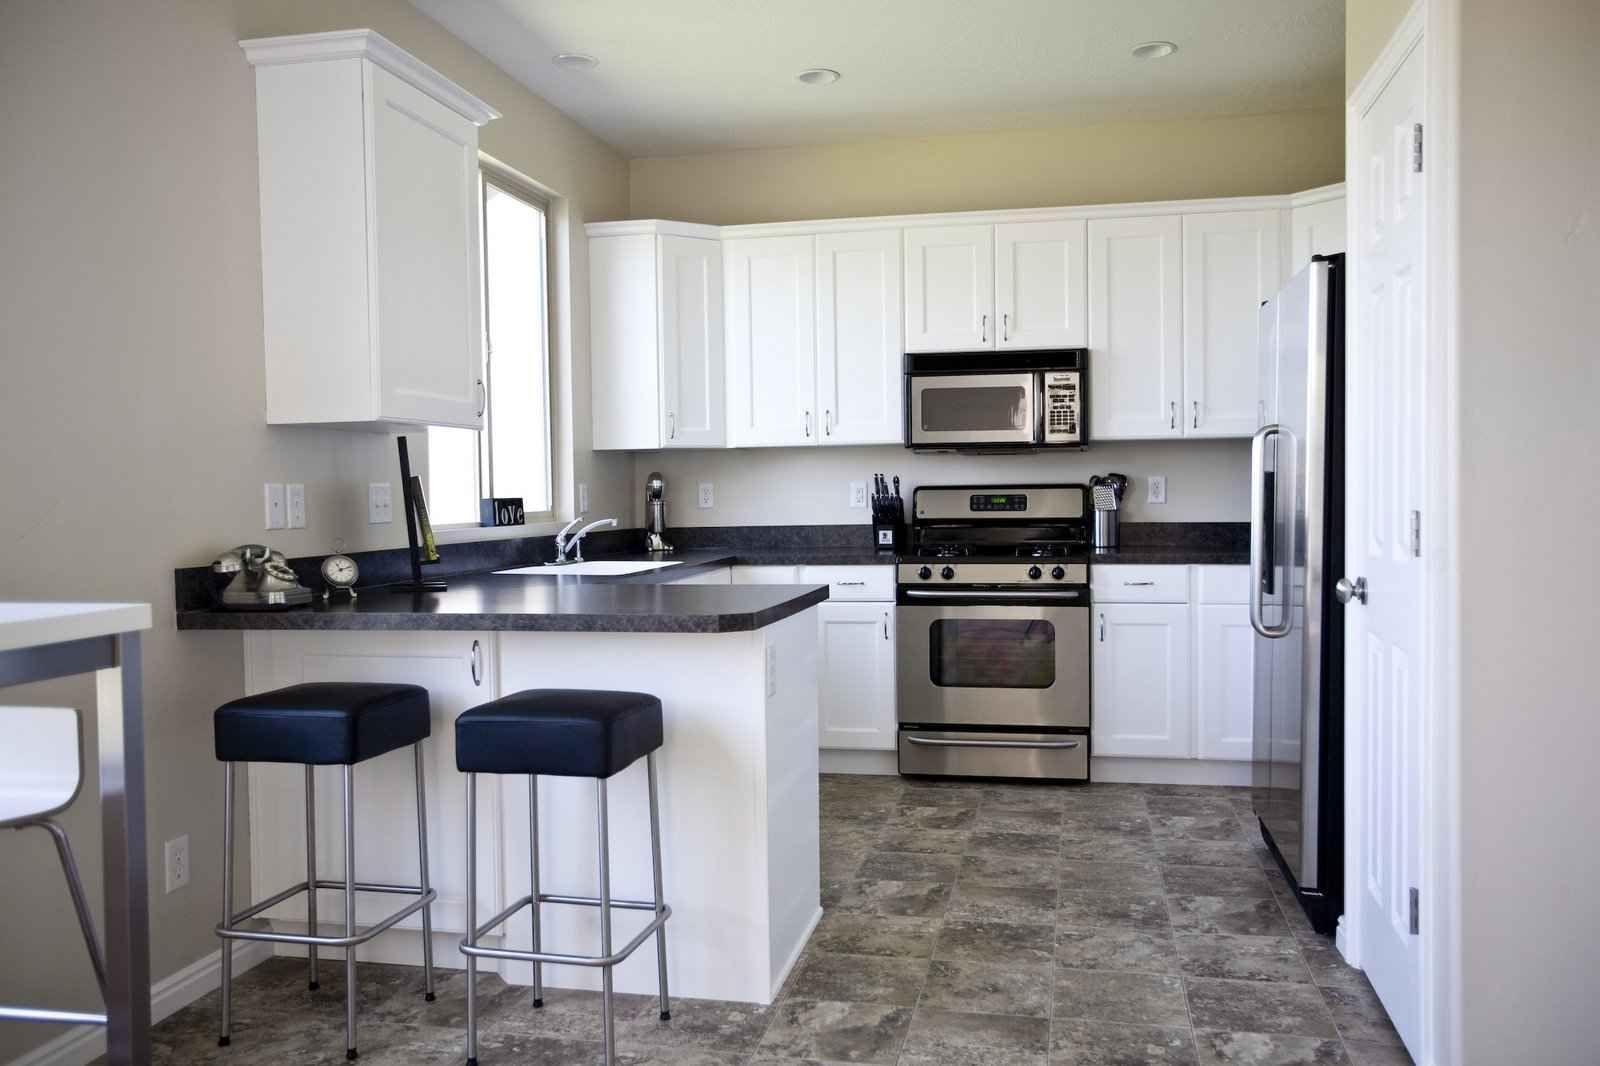 wandbel ge k che designerideen f r badezimmer und wandbel ge f r k chen. Black Bedroom Furniture Sets. Home Design Ideas